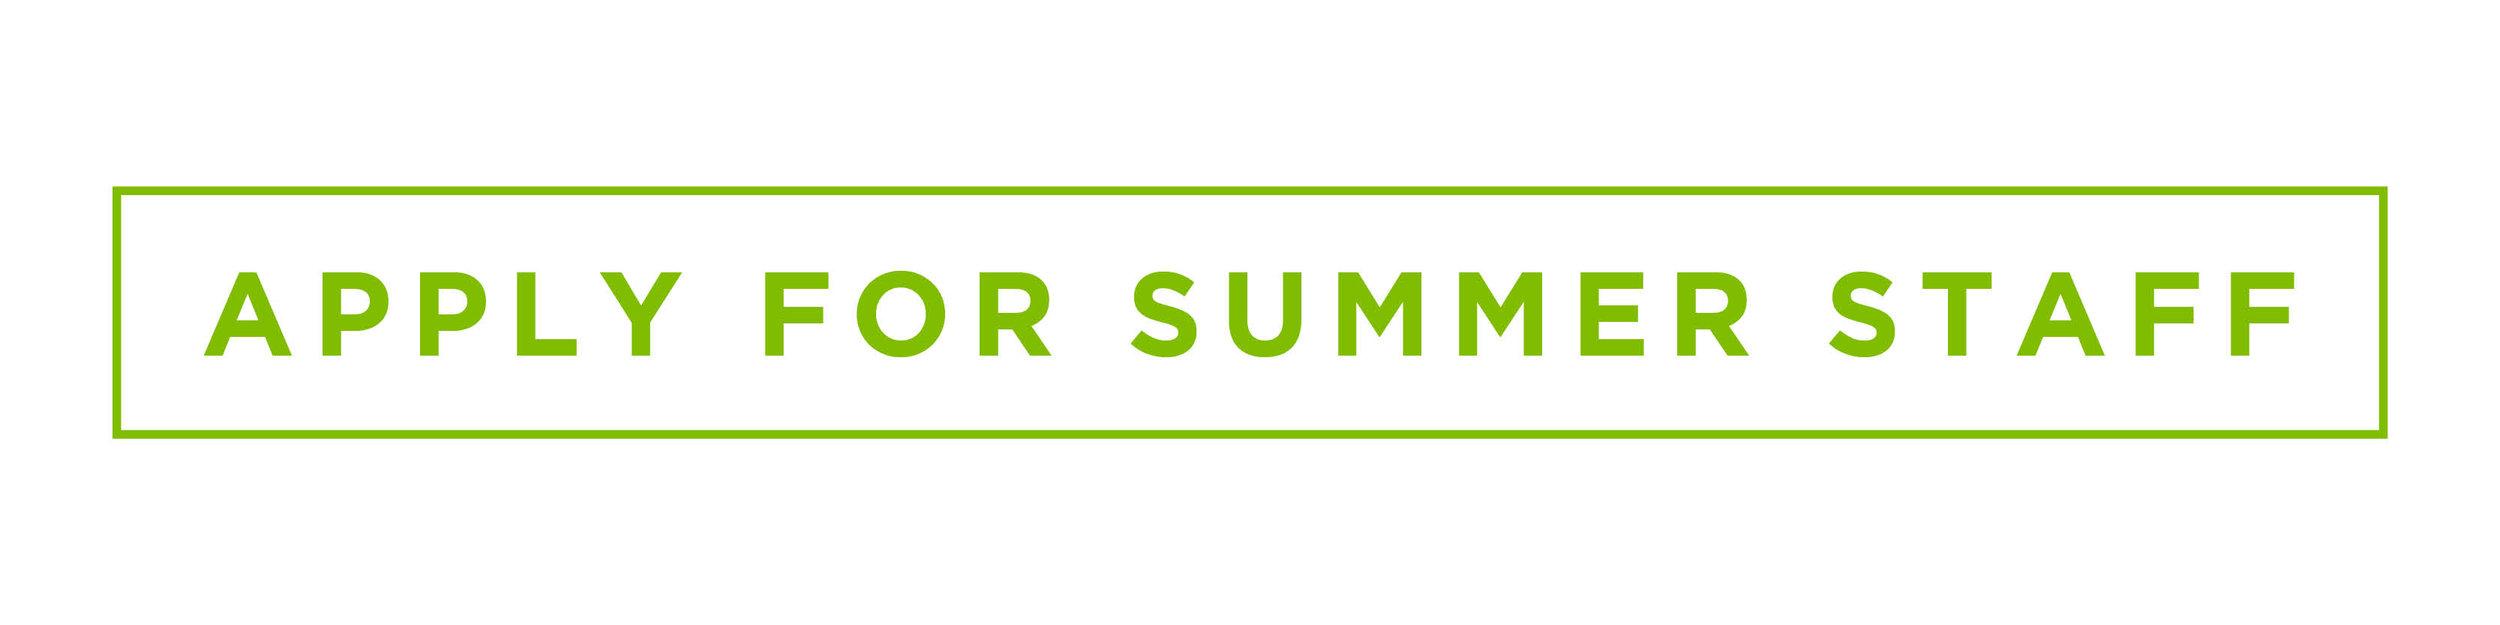 apply for summer staff.jpg